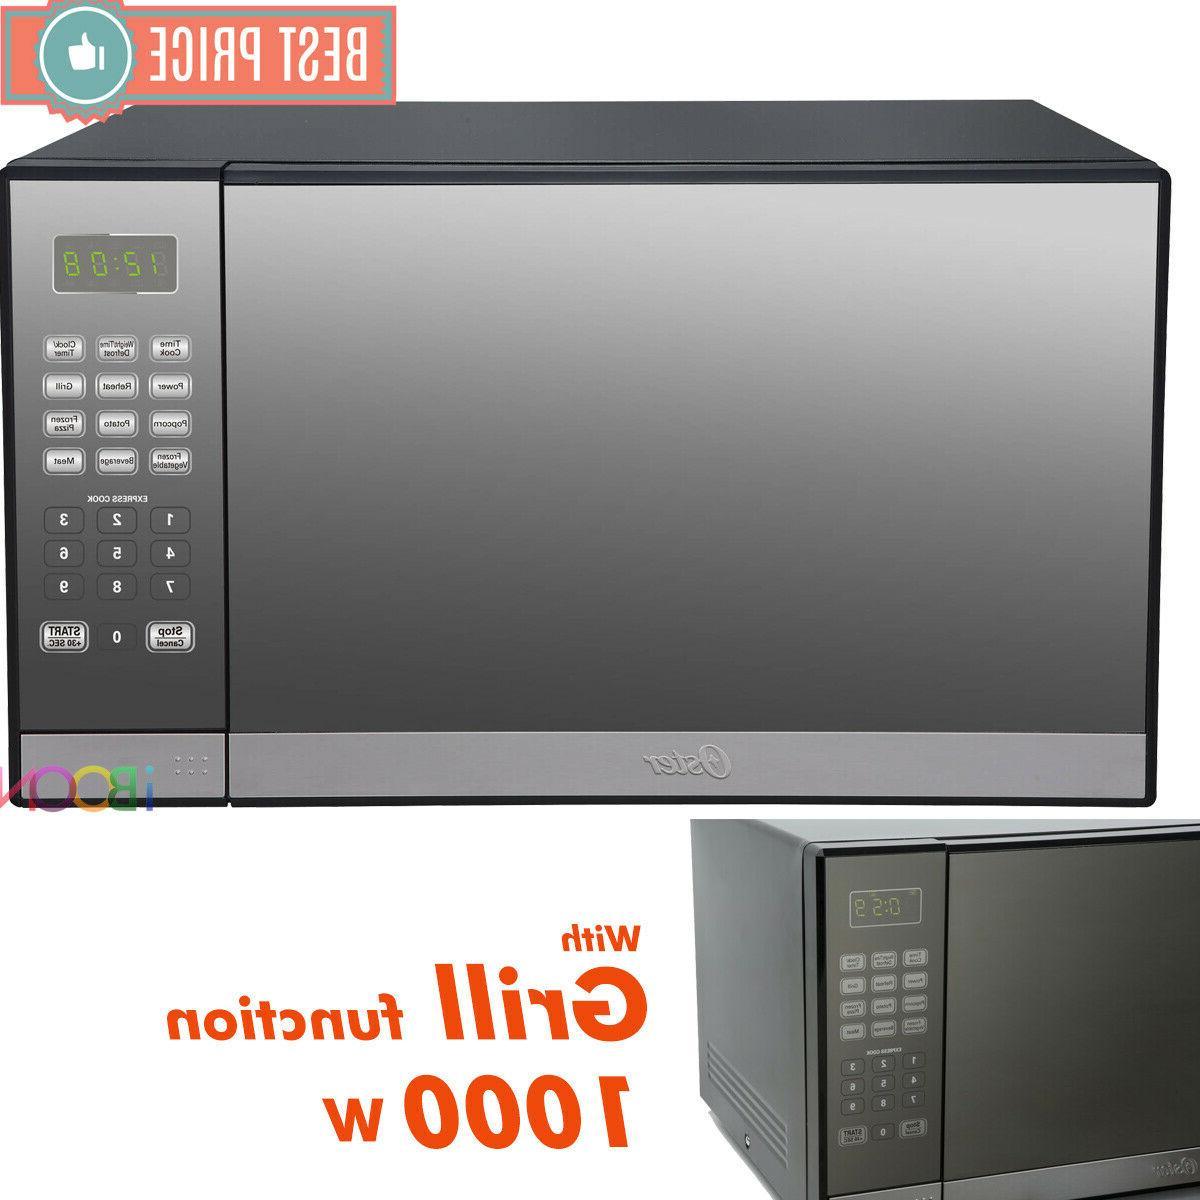 microwave oven countertop stainless steel mirror digital